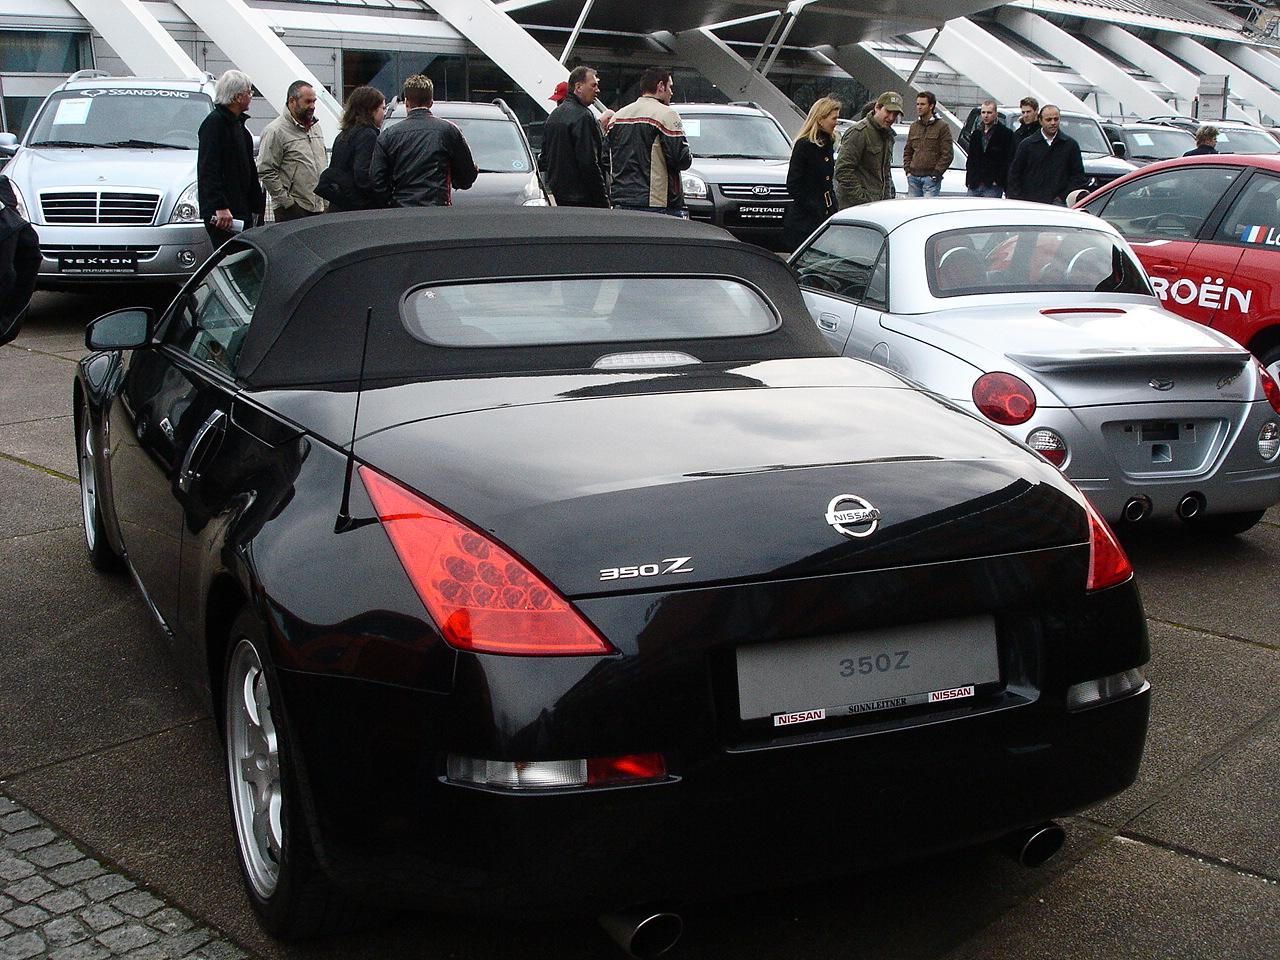 Nissan 350z Black File:Nissan 350...